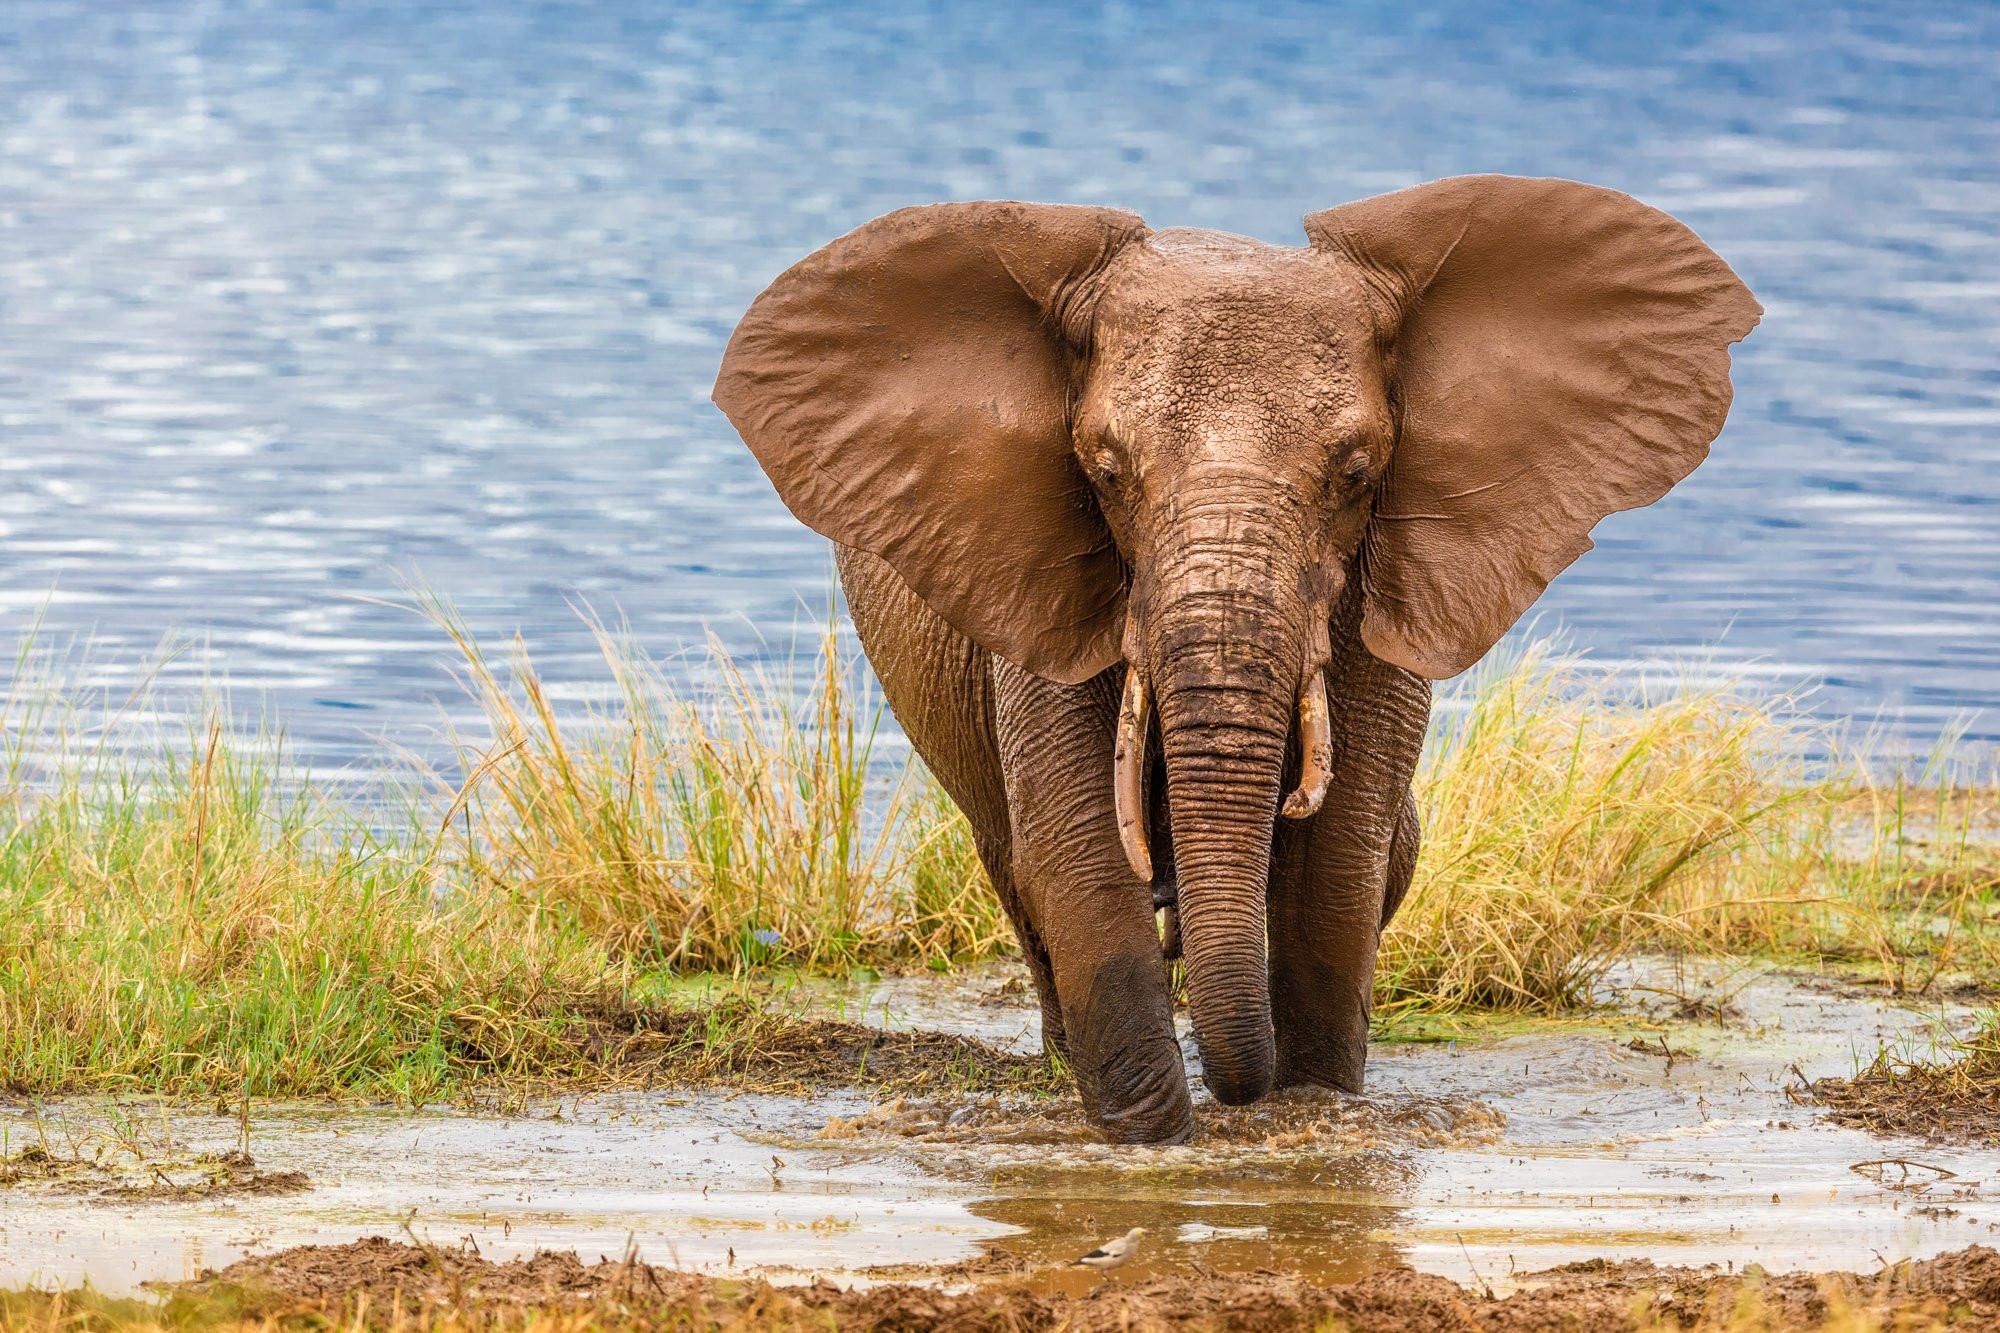 Beautiful elephant in Tarangire National Park, Tanzania